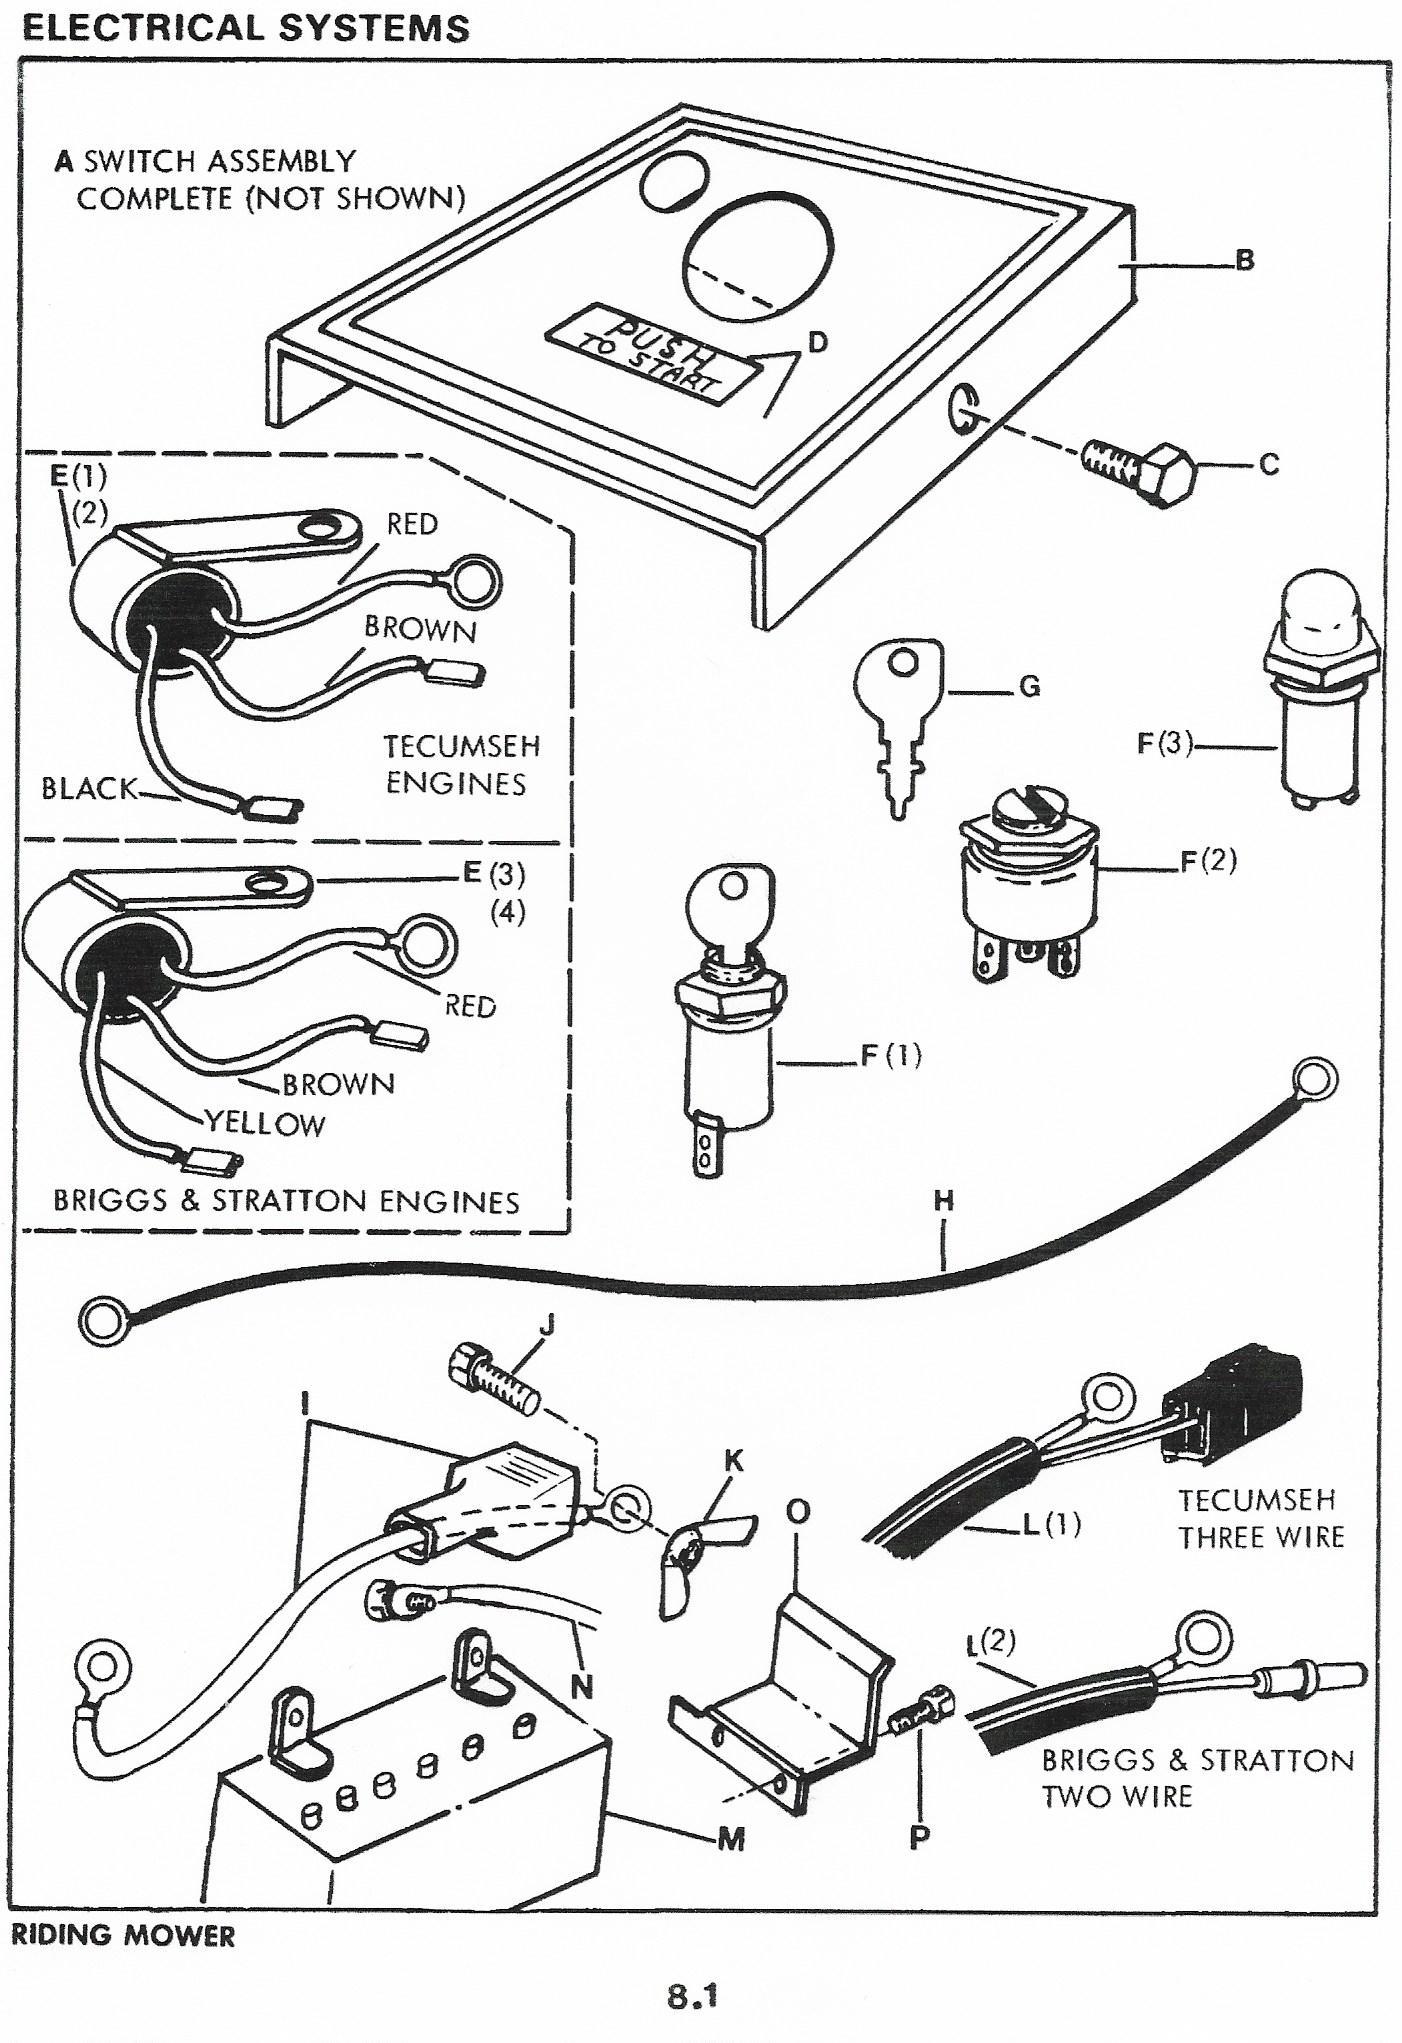 snapper ignition switch wiring diagram - wiring diagram source-c -  source-c.cartazuccherobio.it  source-c.cartazuccherobio.it